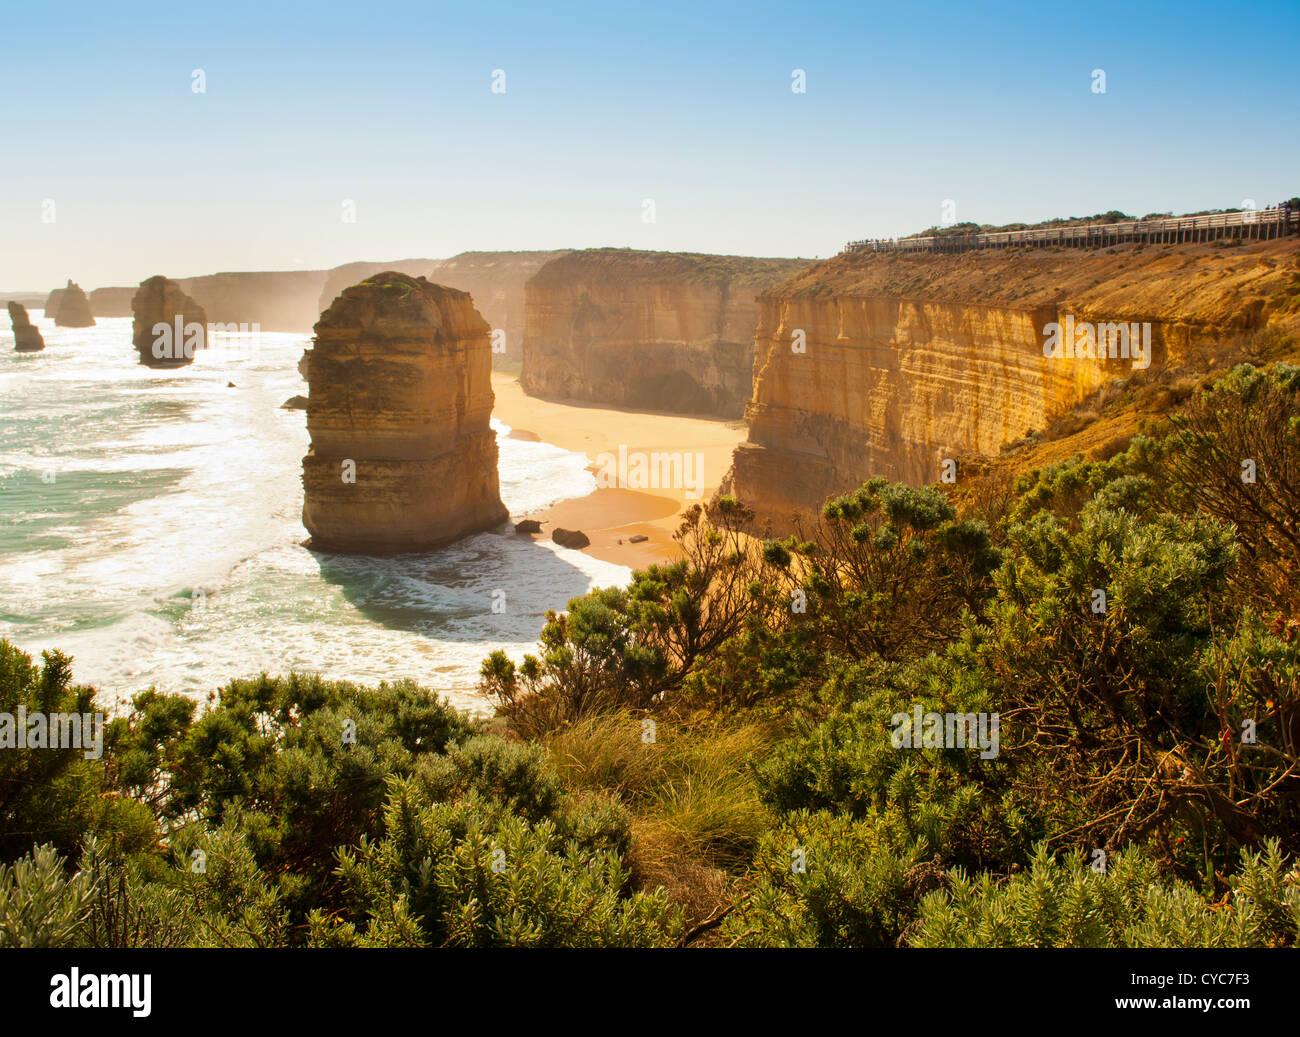 Twelve Apostles, famous landmark along the Great Ocean Road, Australia Stock Photo